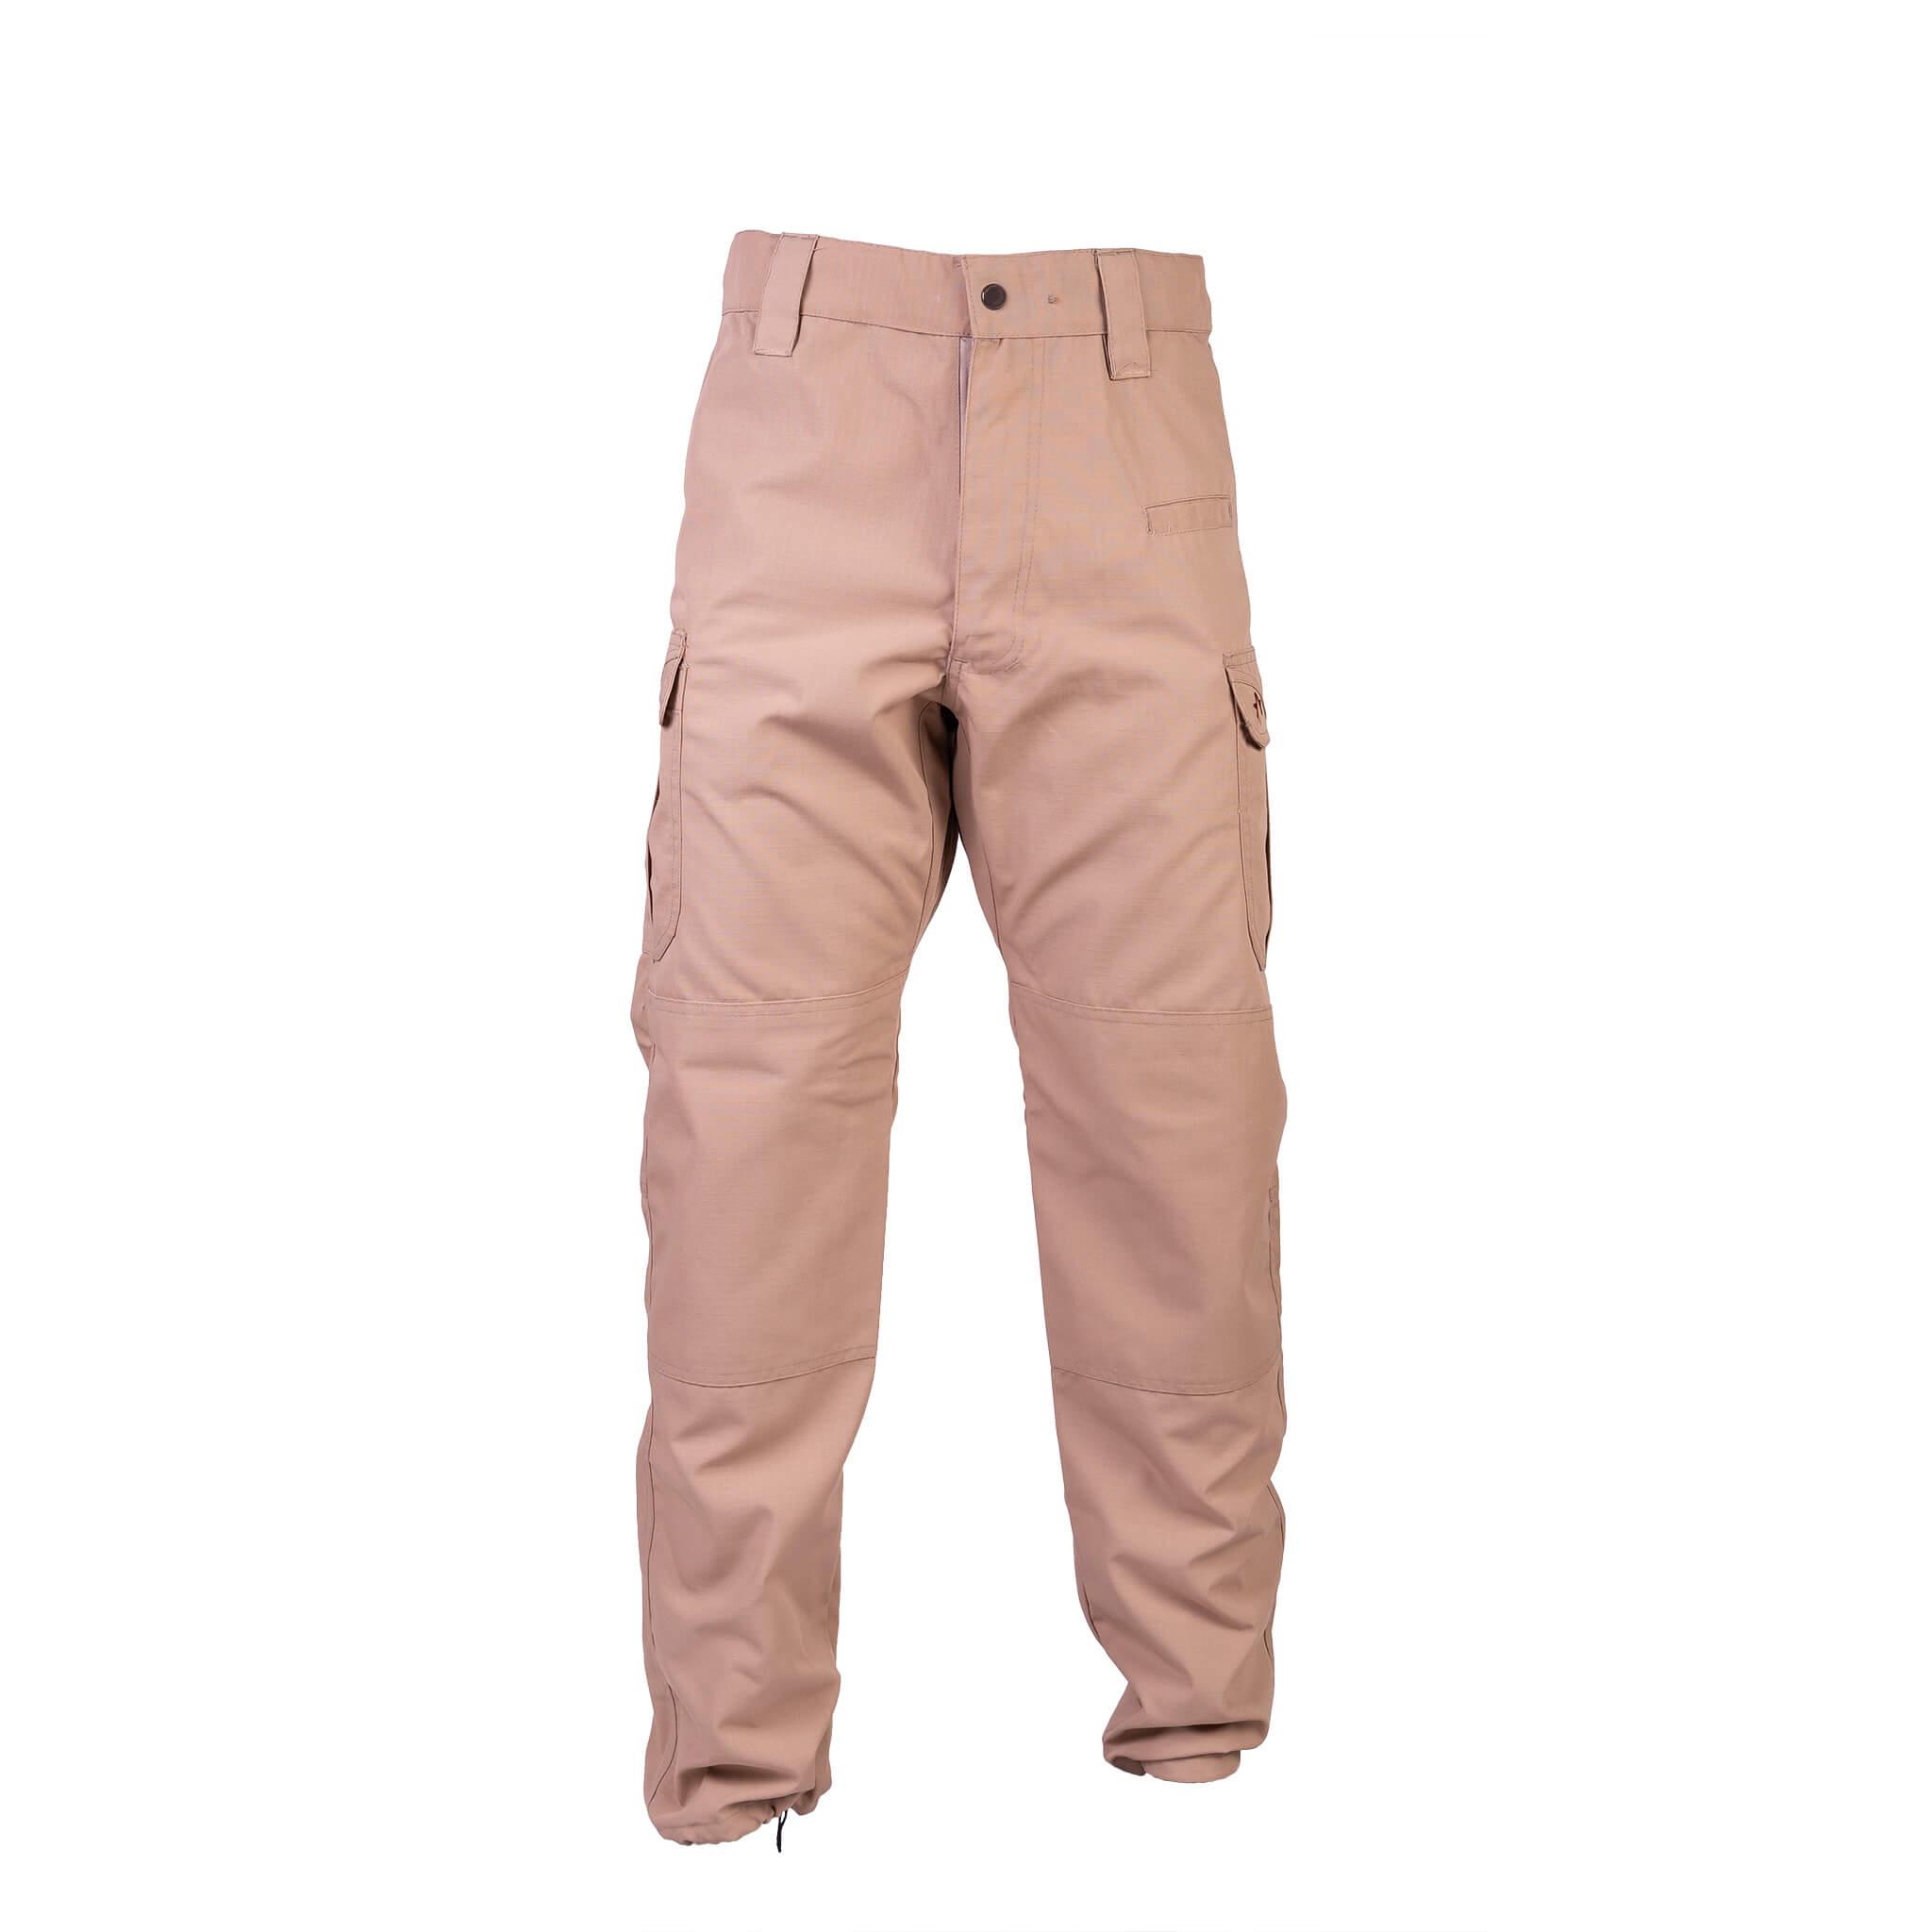 Pantalon tactico Arena_2984